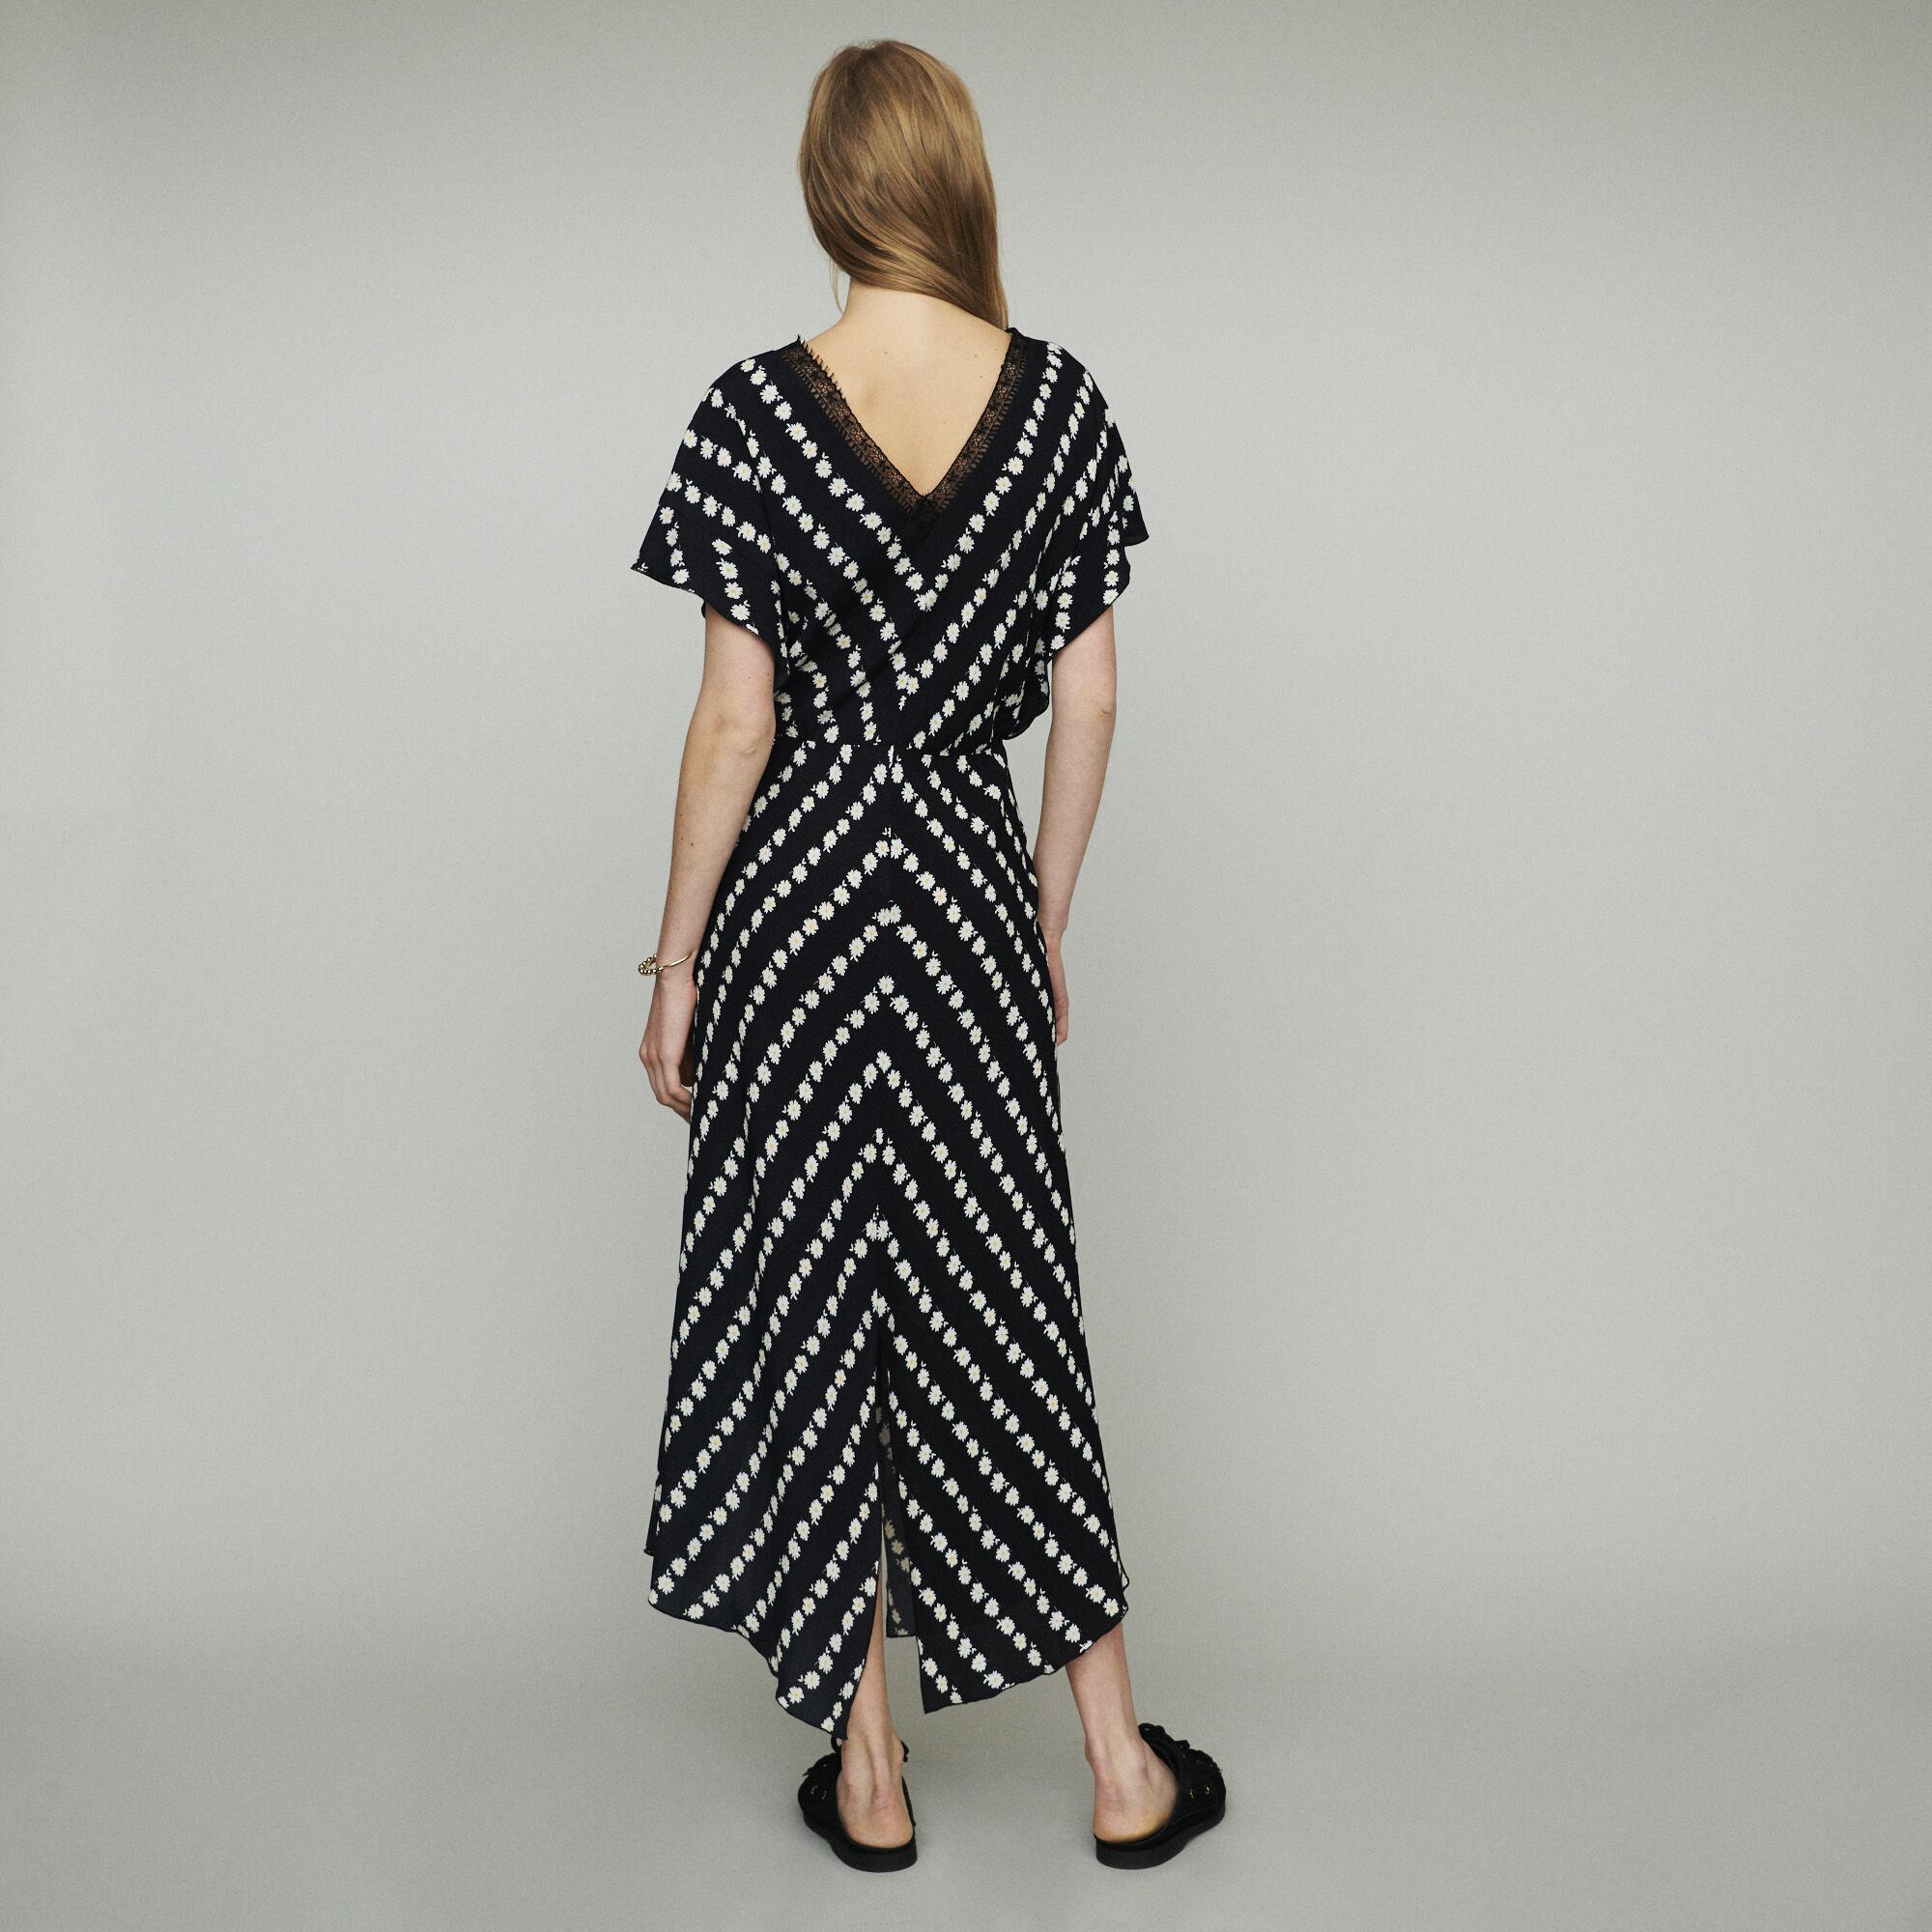 Robe Longue RobesMaje Imprimé Paris Marguerite Ritta À PXOTukZi